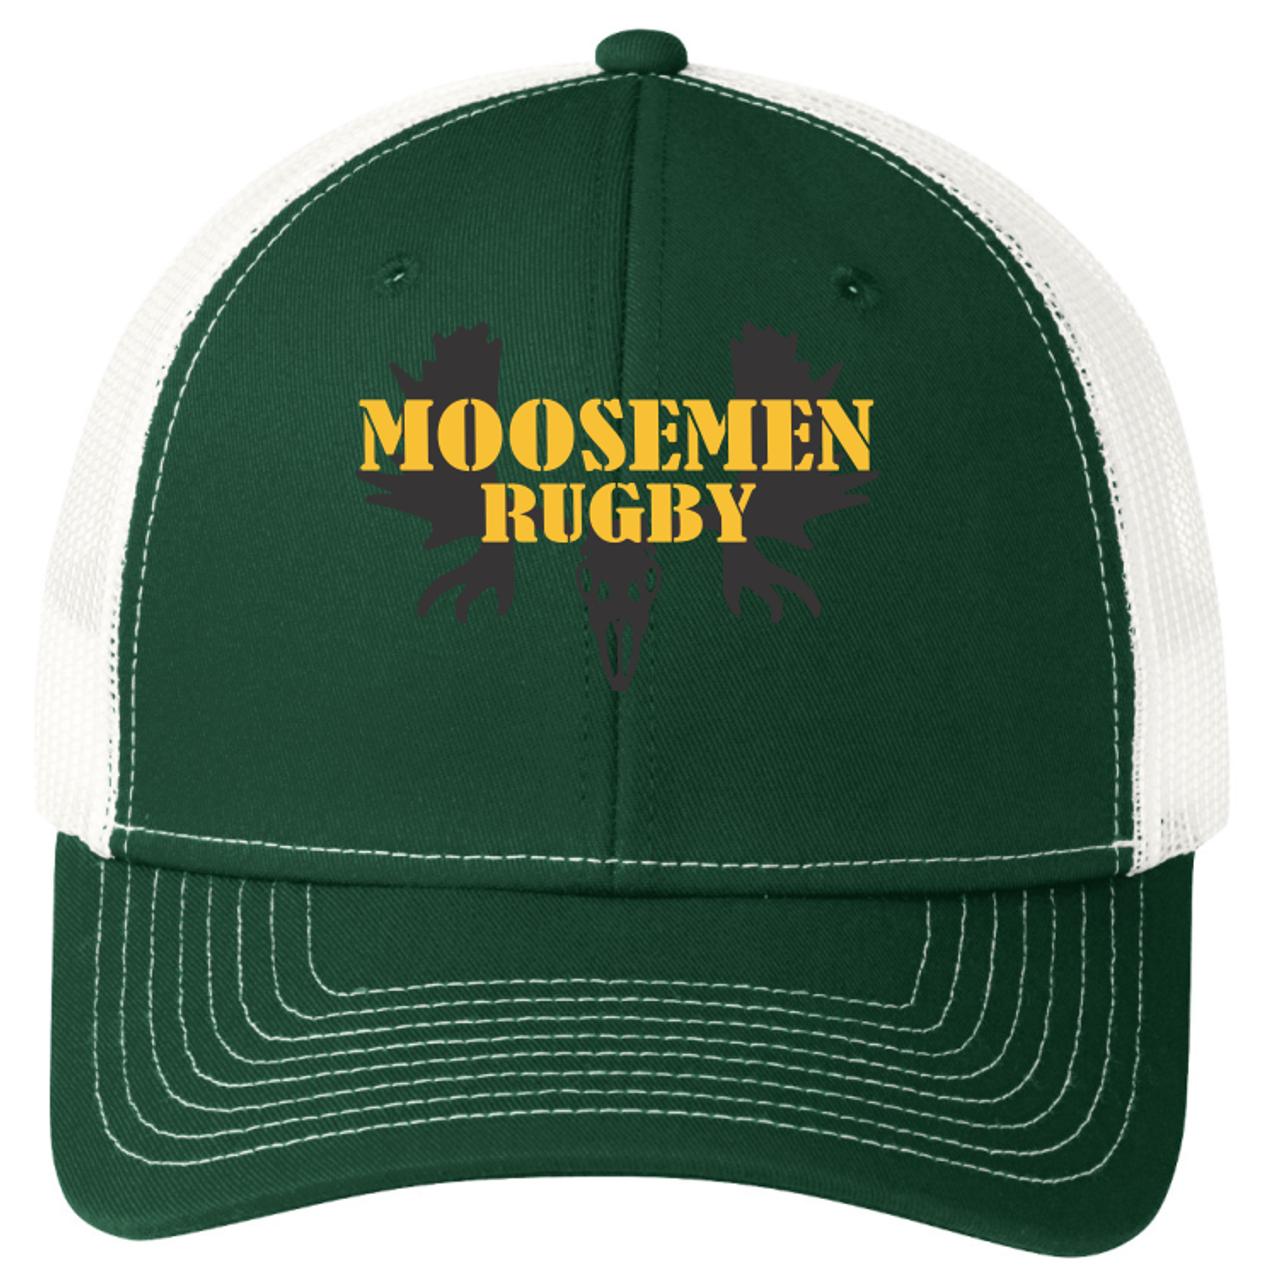 Moosemen Rugby Snapback Mesh Hat